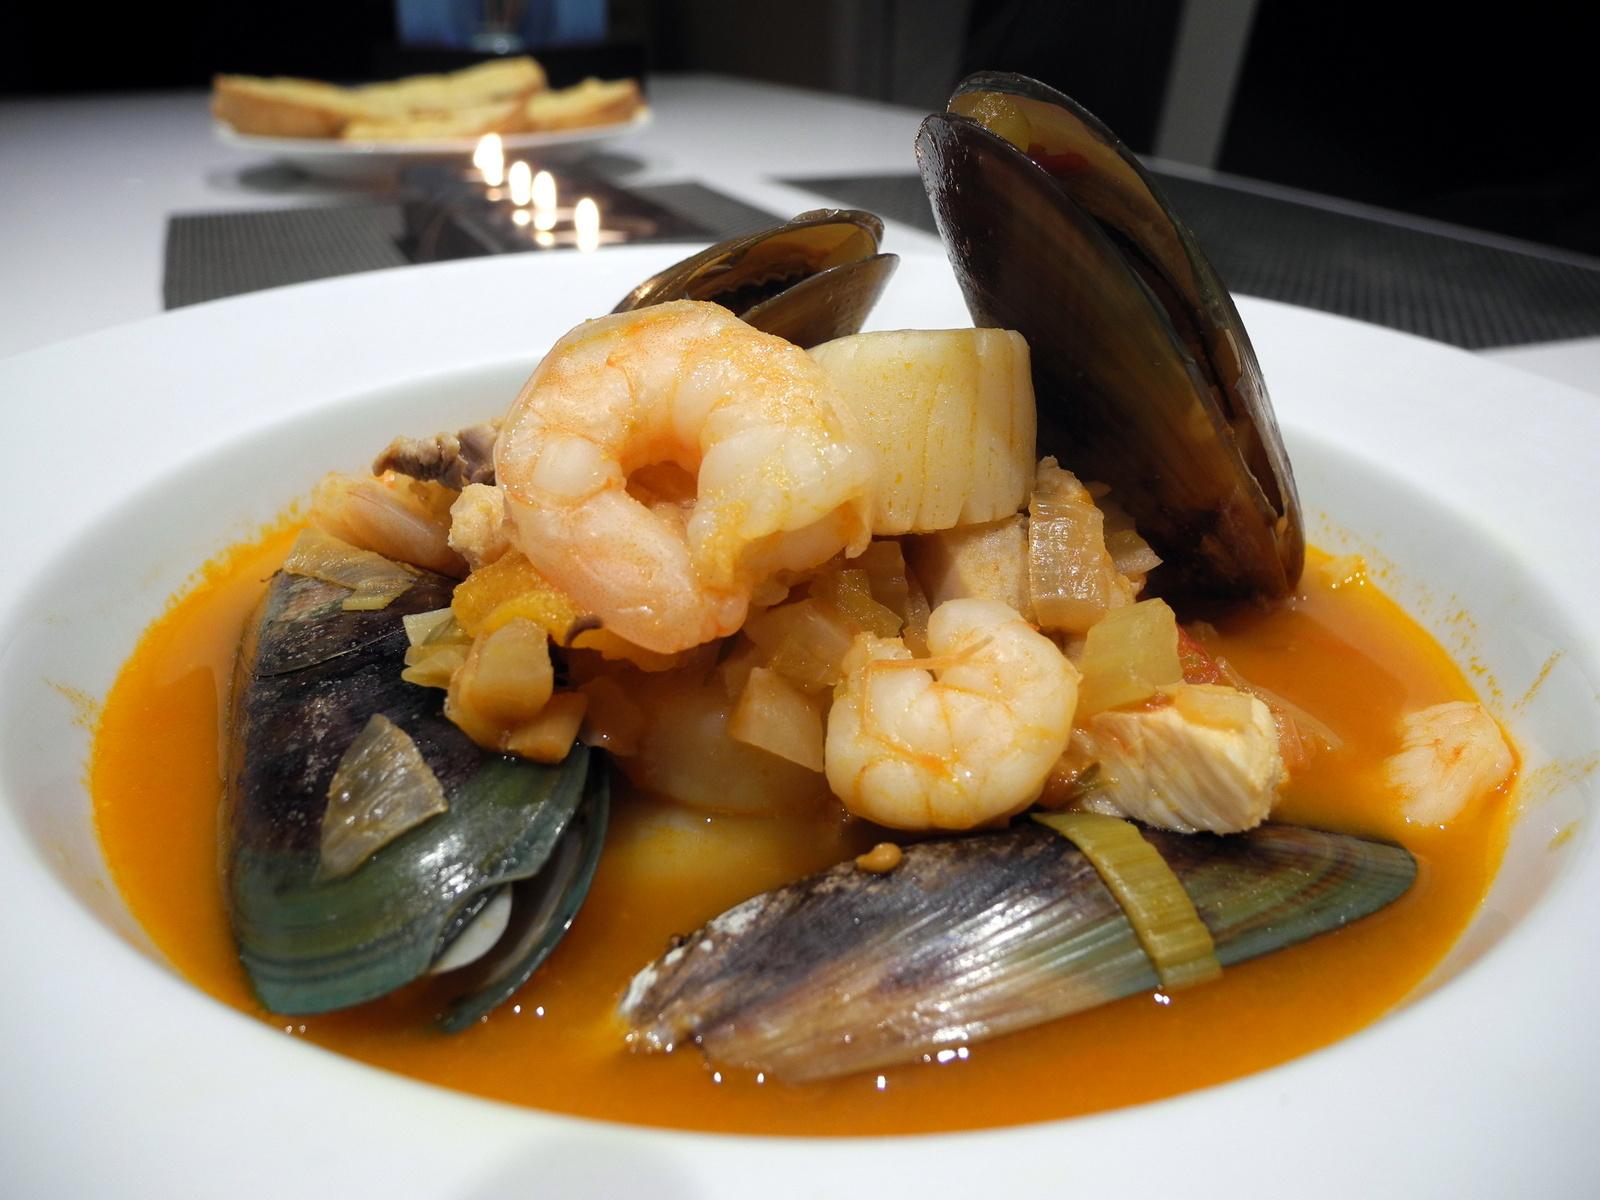 Foodie Ling: Seafood Bouillabaisse